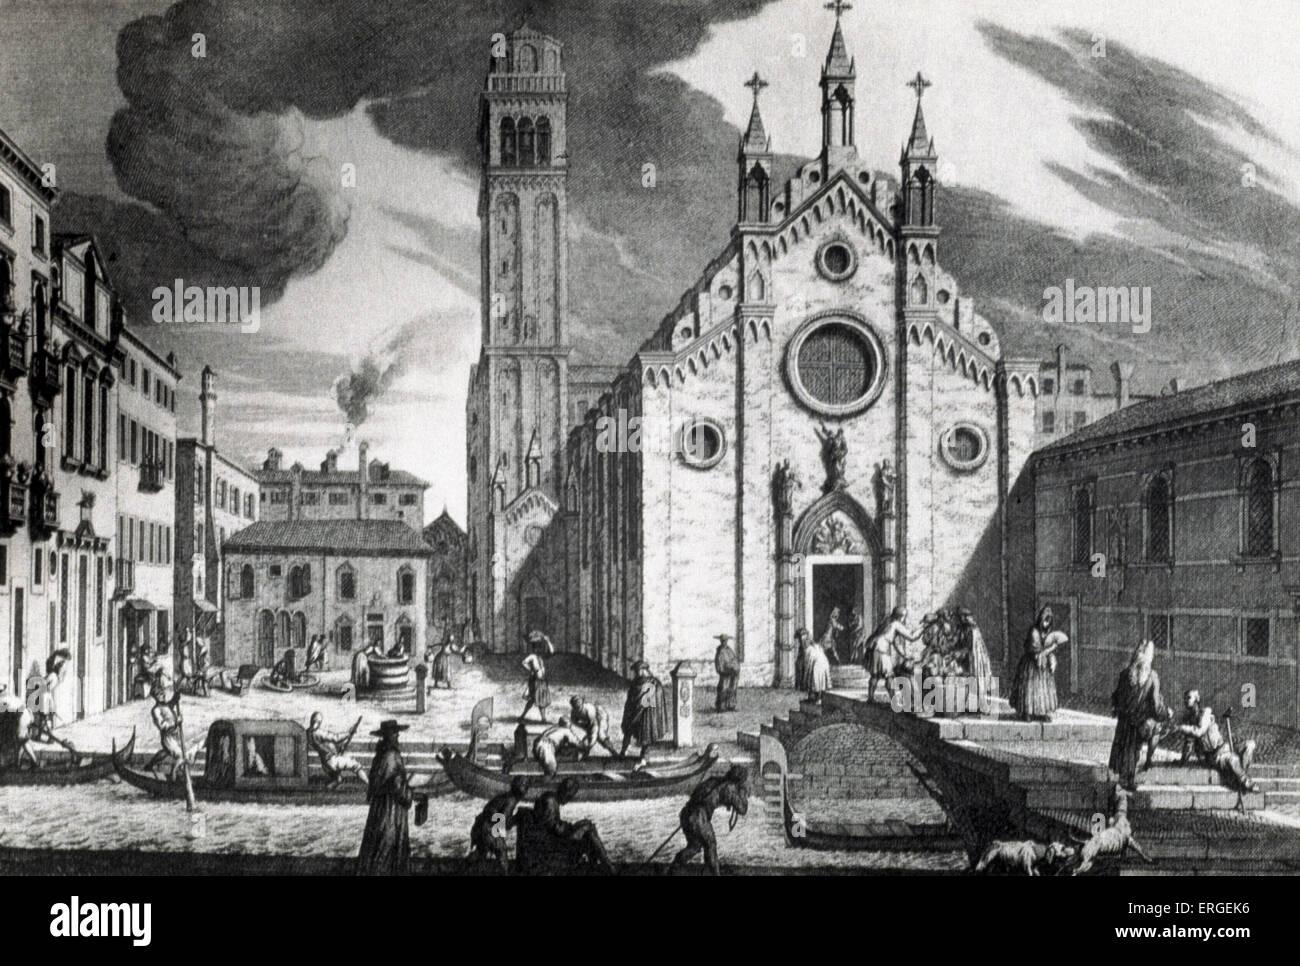 VENICE - CHURCH OF THE FRARI View from the Canal.  Gondolas in front of square. Time of Vivaldi, Albinoni, Galuppi, - Stock Image